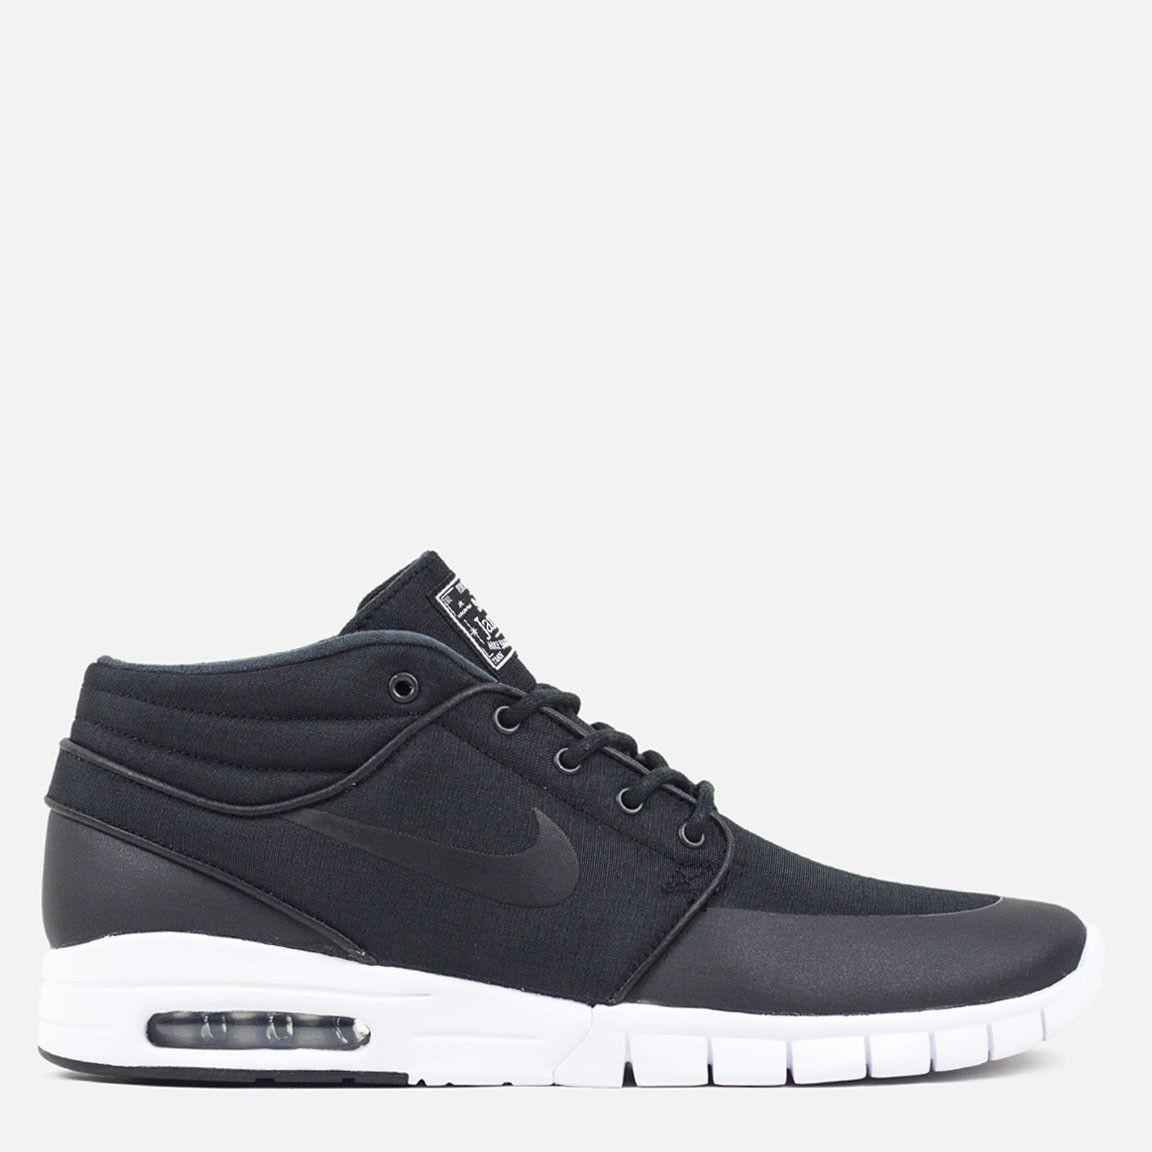 online store f563e ed4f0 Nike SB Stefan Janoski Max Mid - Black Black Metallic Silver White – Commonn